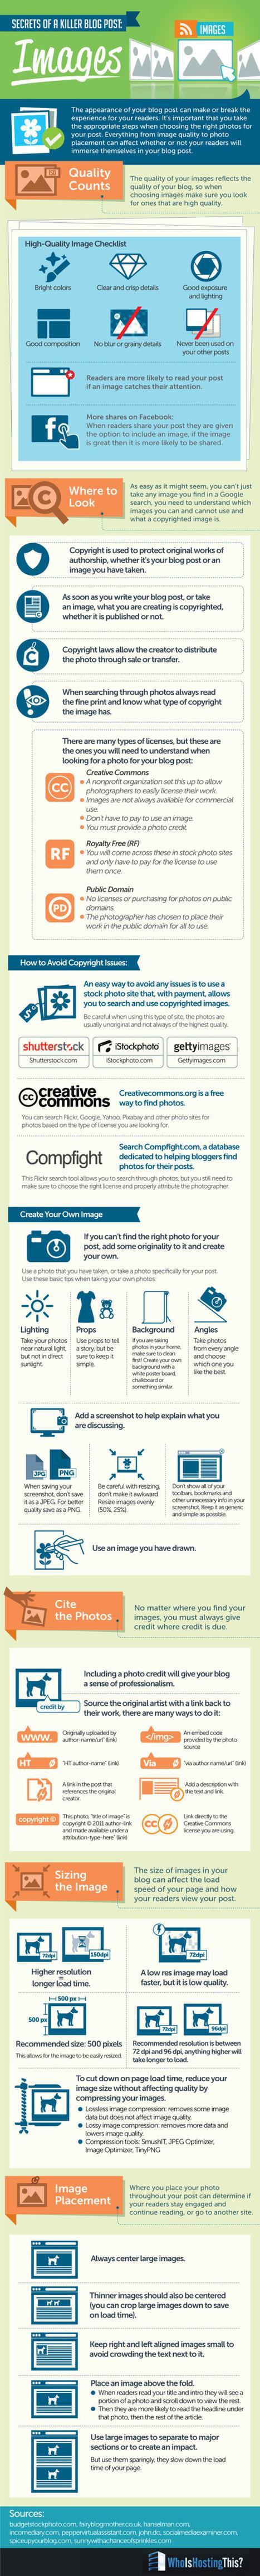 Secrets of a Killer Blog Post:Images [infographic] | COMMUNITY MANAGEMENT - CM2 | Scoop.it